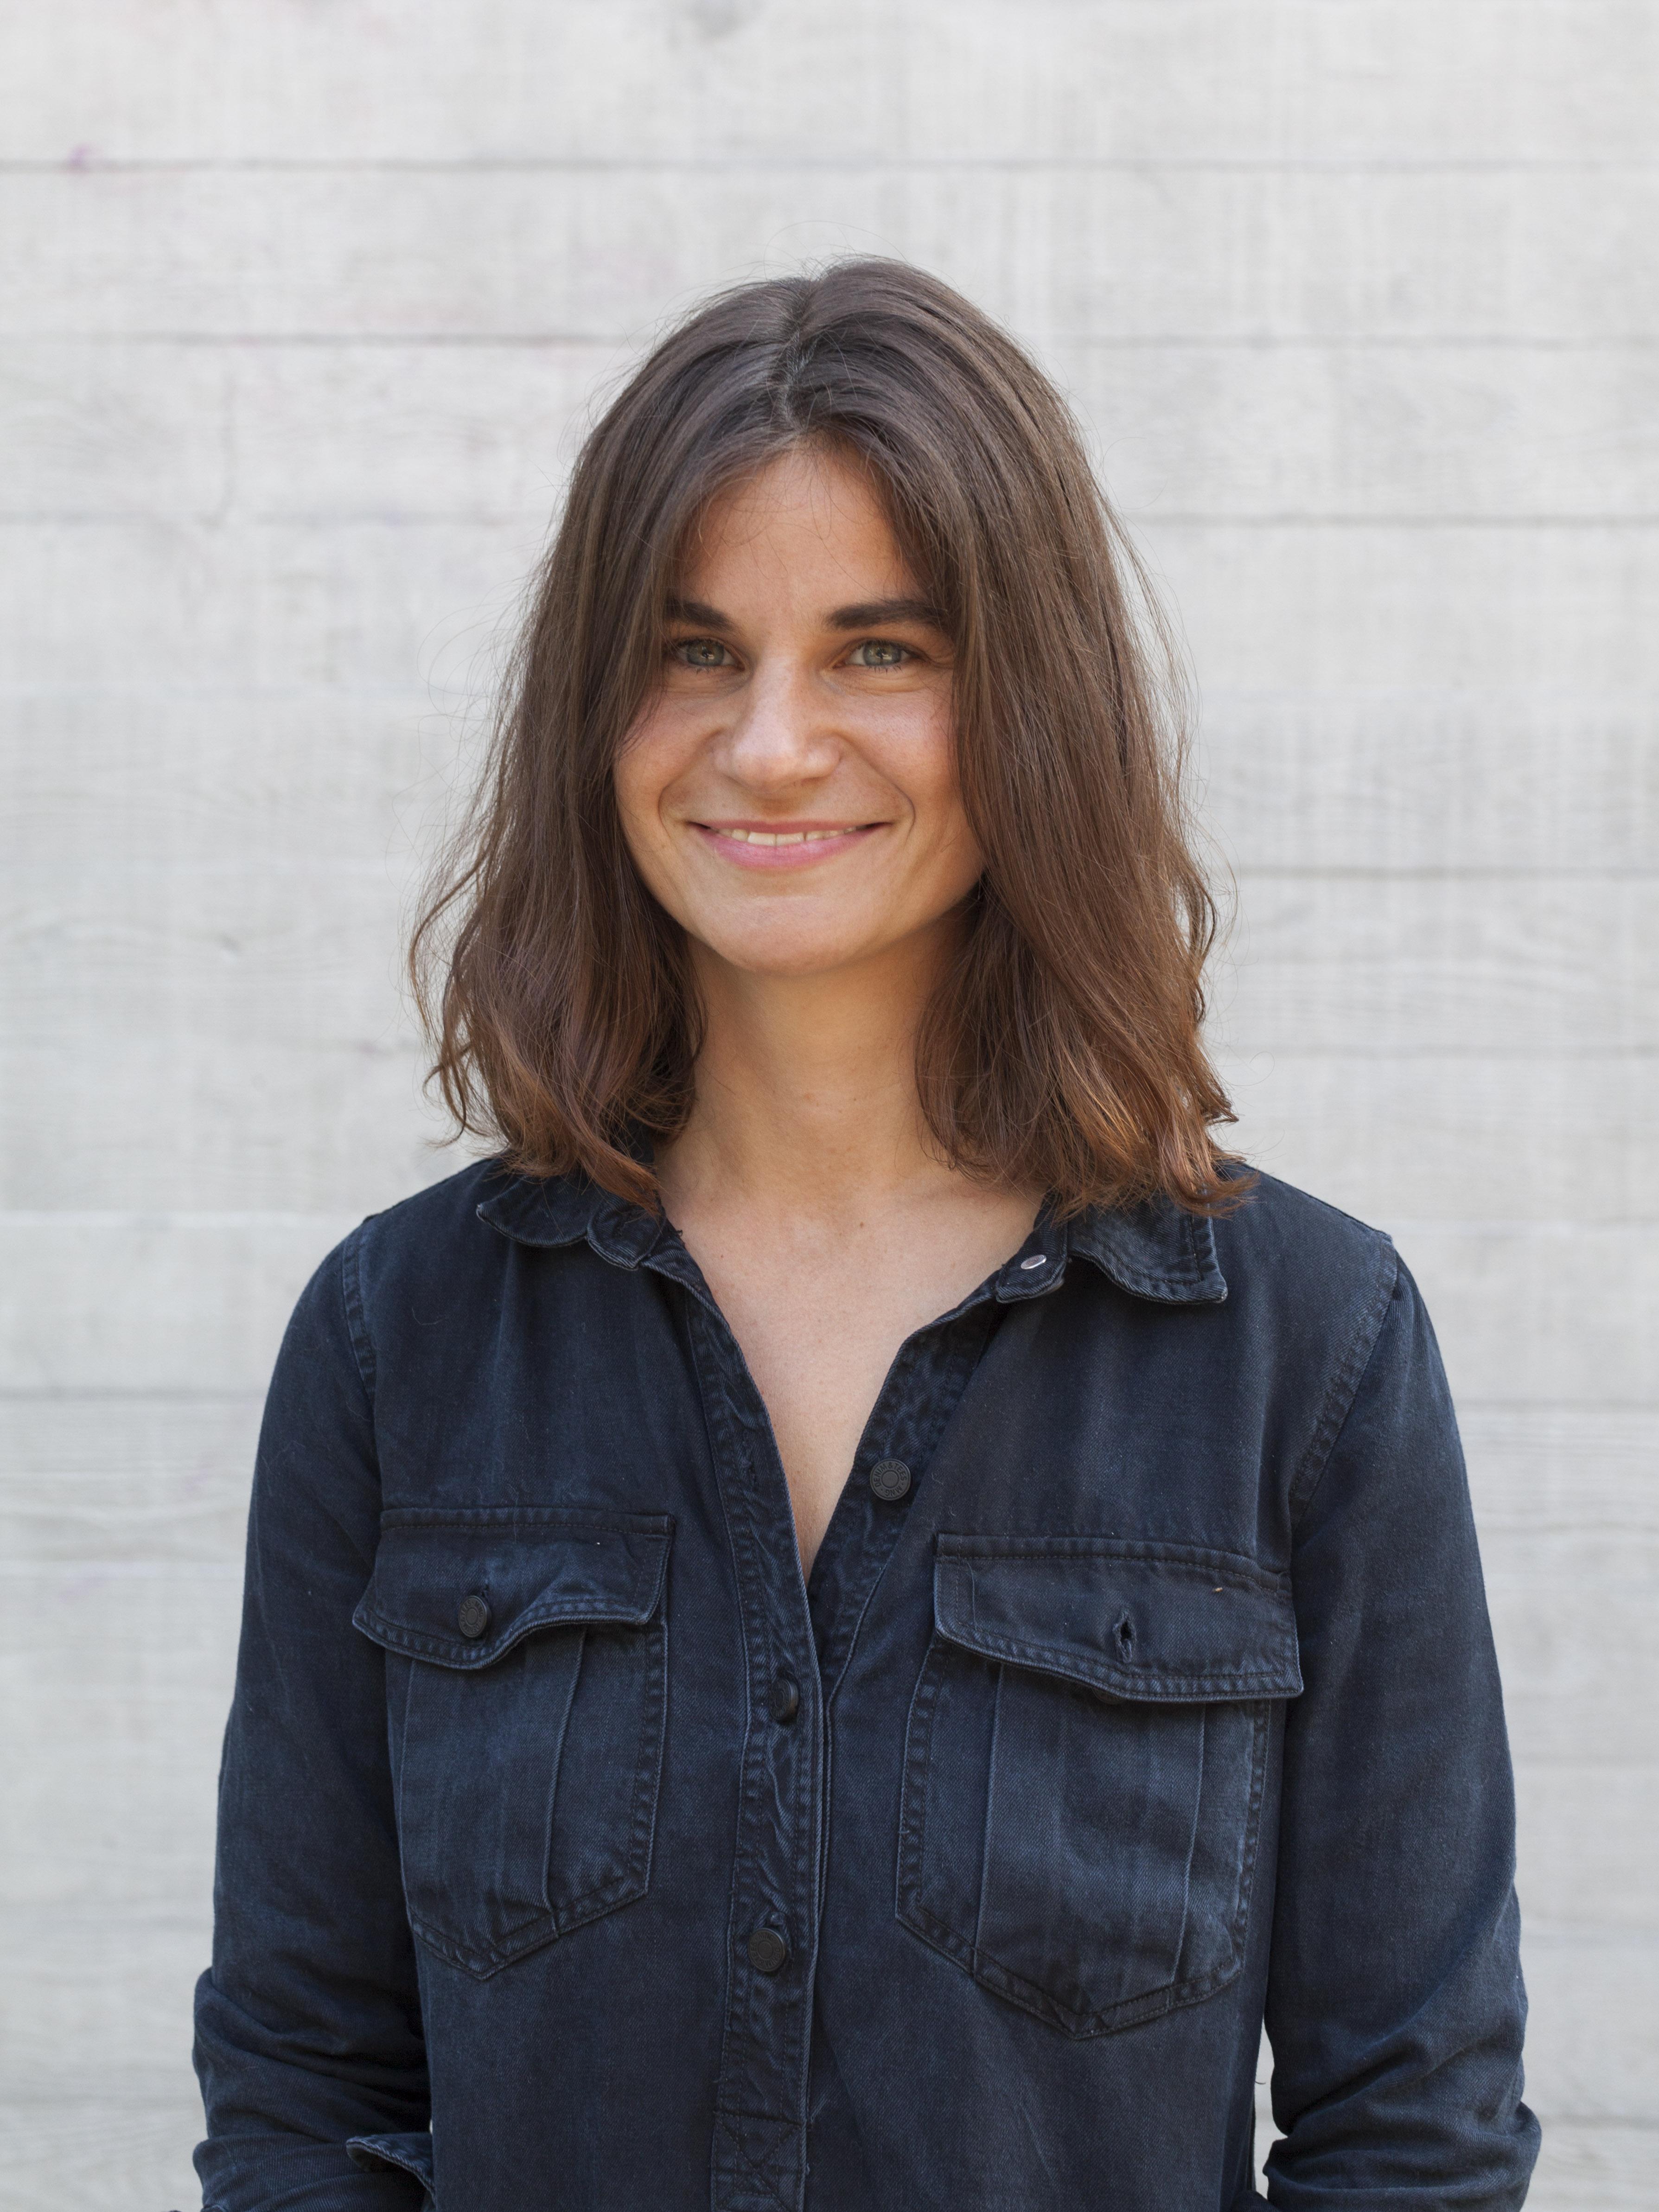 Nina Eckhardt (by Doro Zinn)